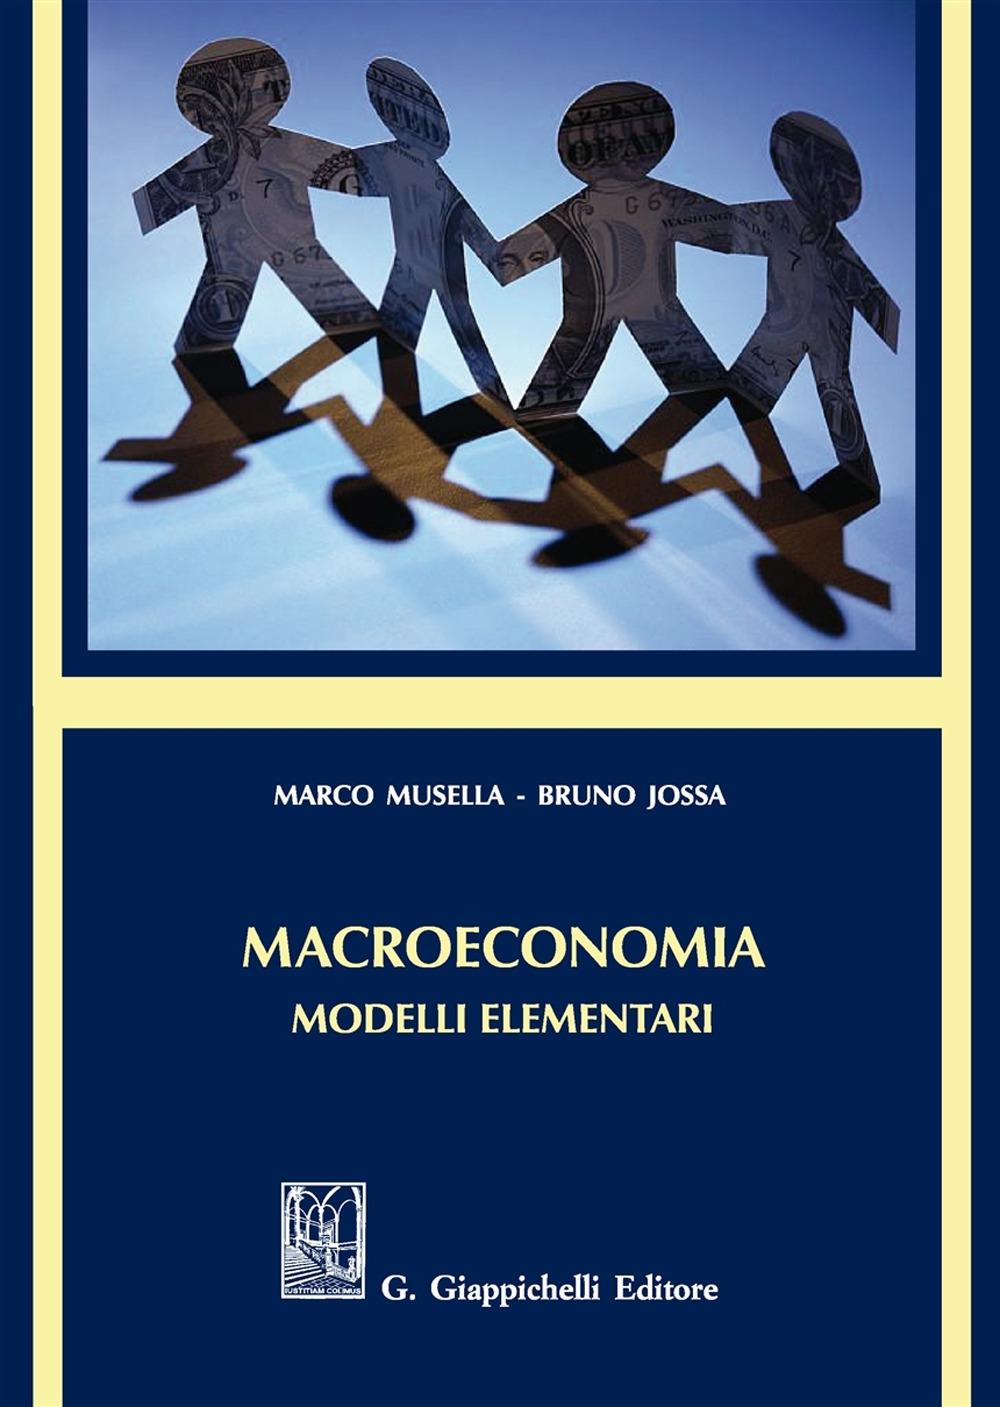 Macroeconomia. Modelli elementari